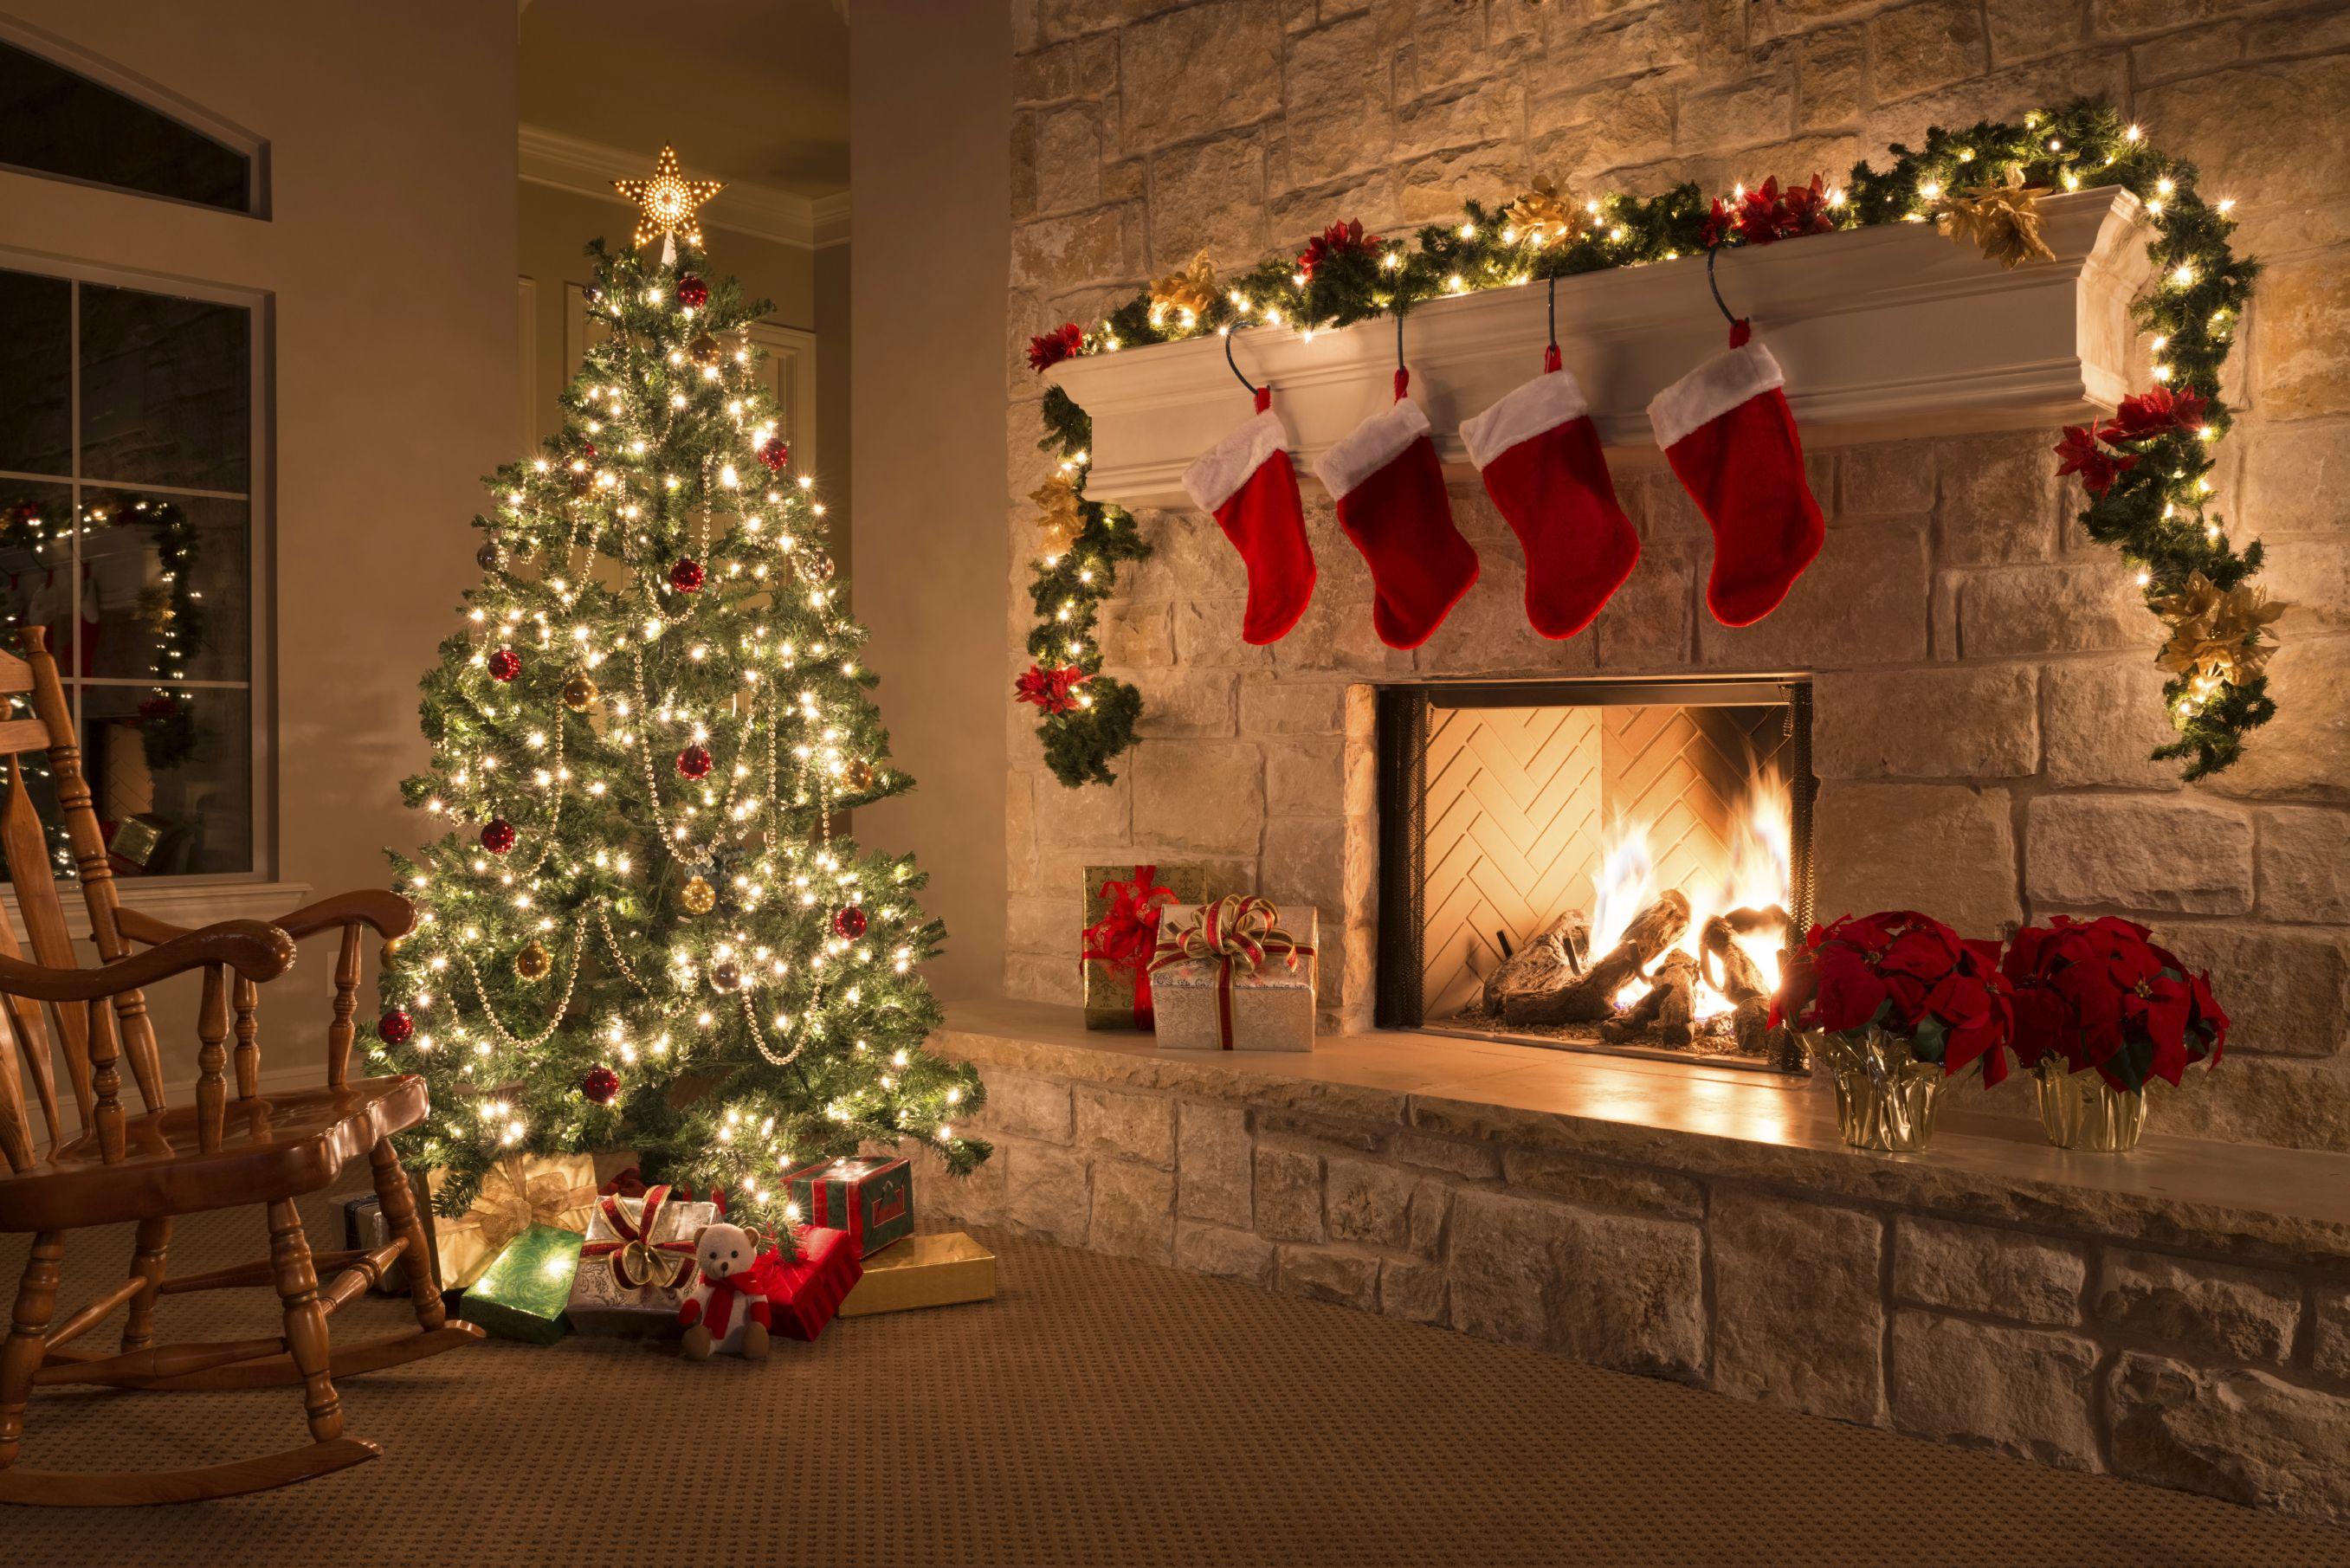 Pin By Maria Fechter On Winter Wonderland Background Christmas Fireplace Christmas Wall Decor Christmas Spirit